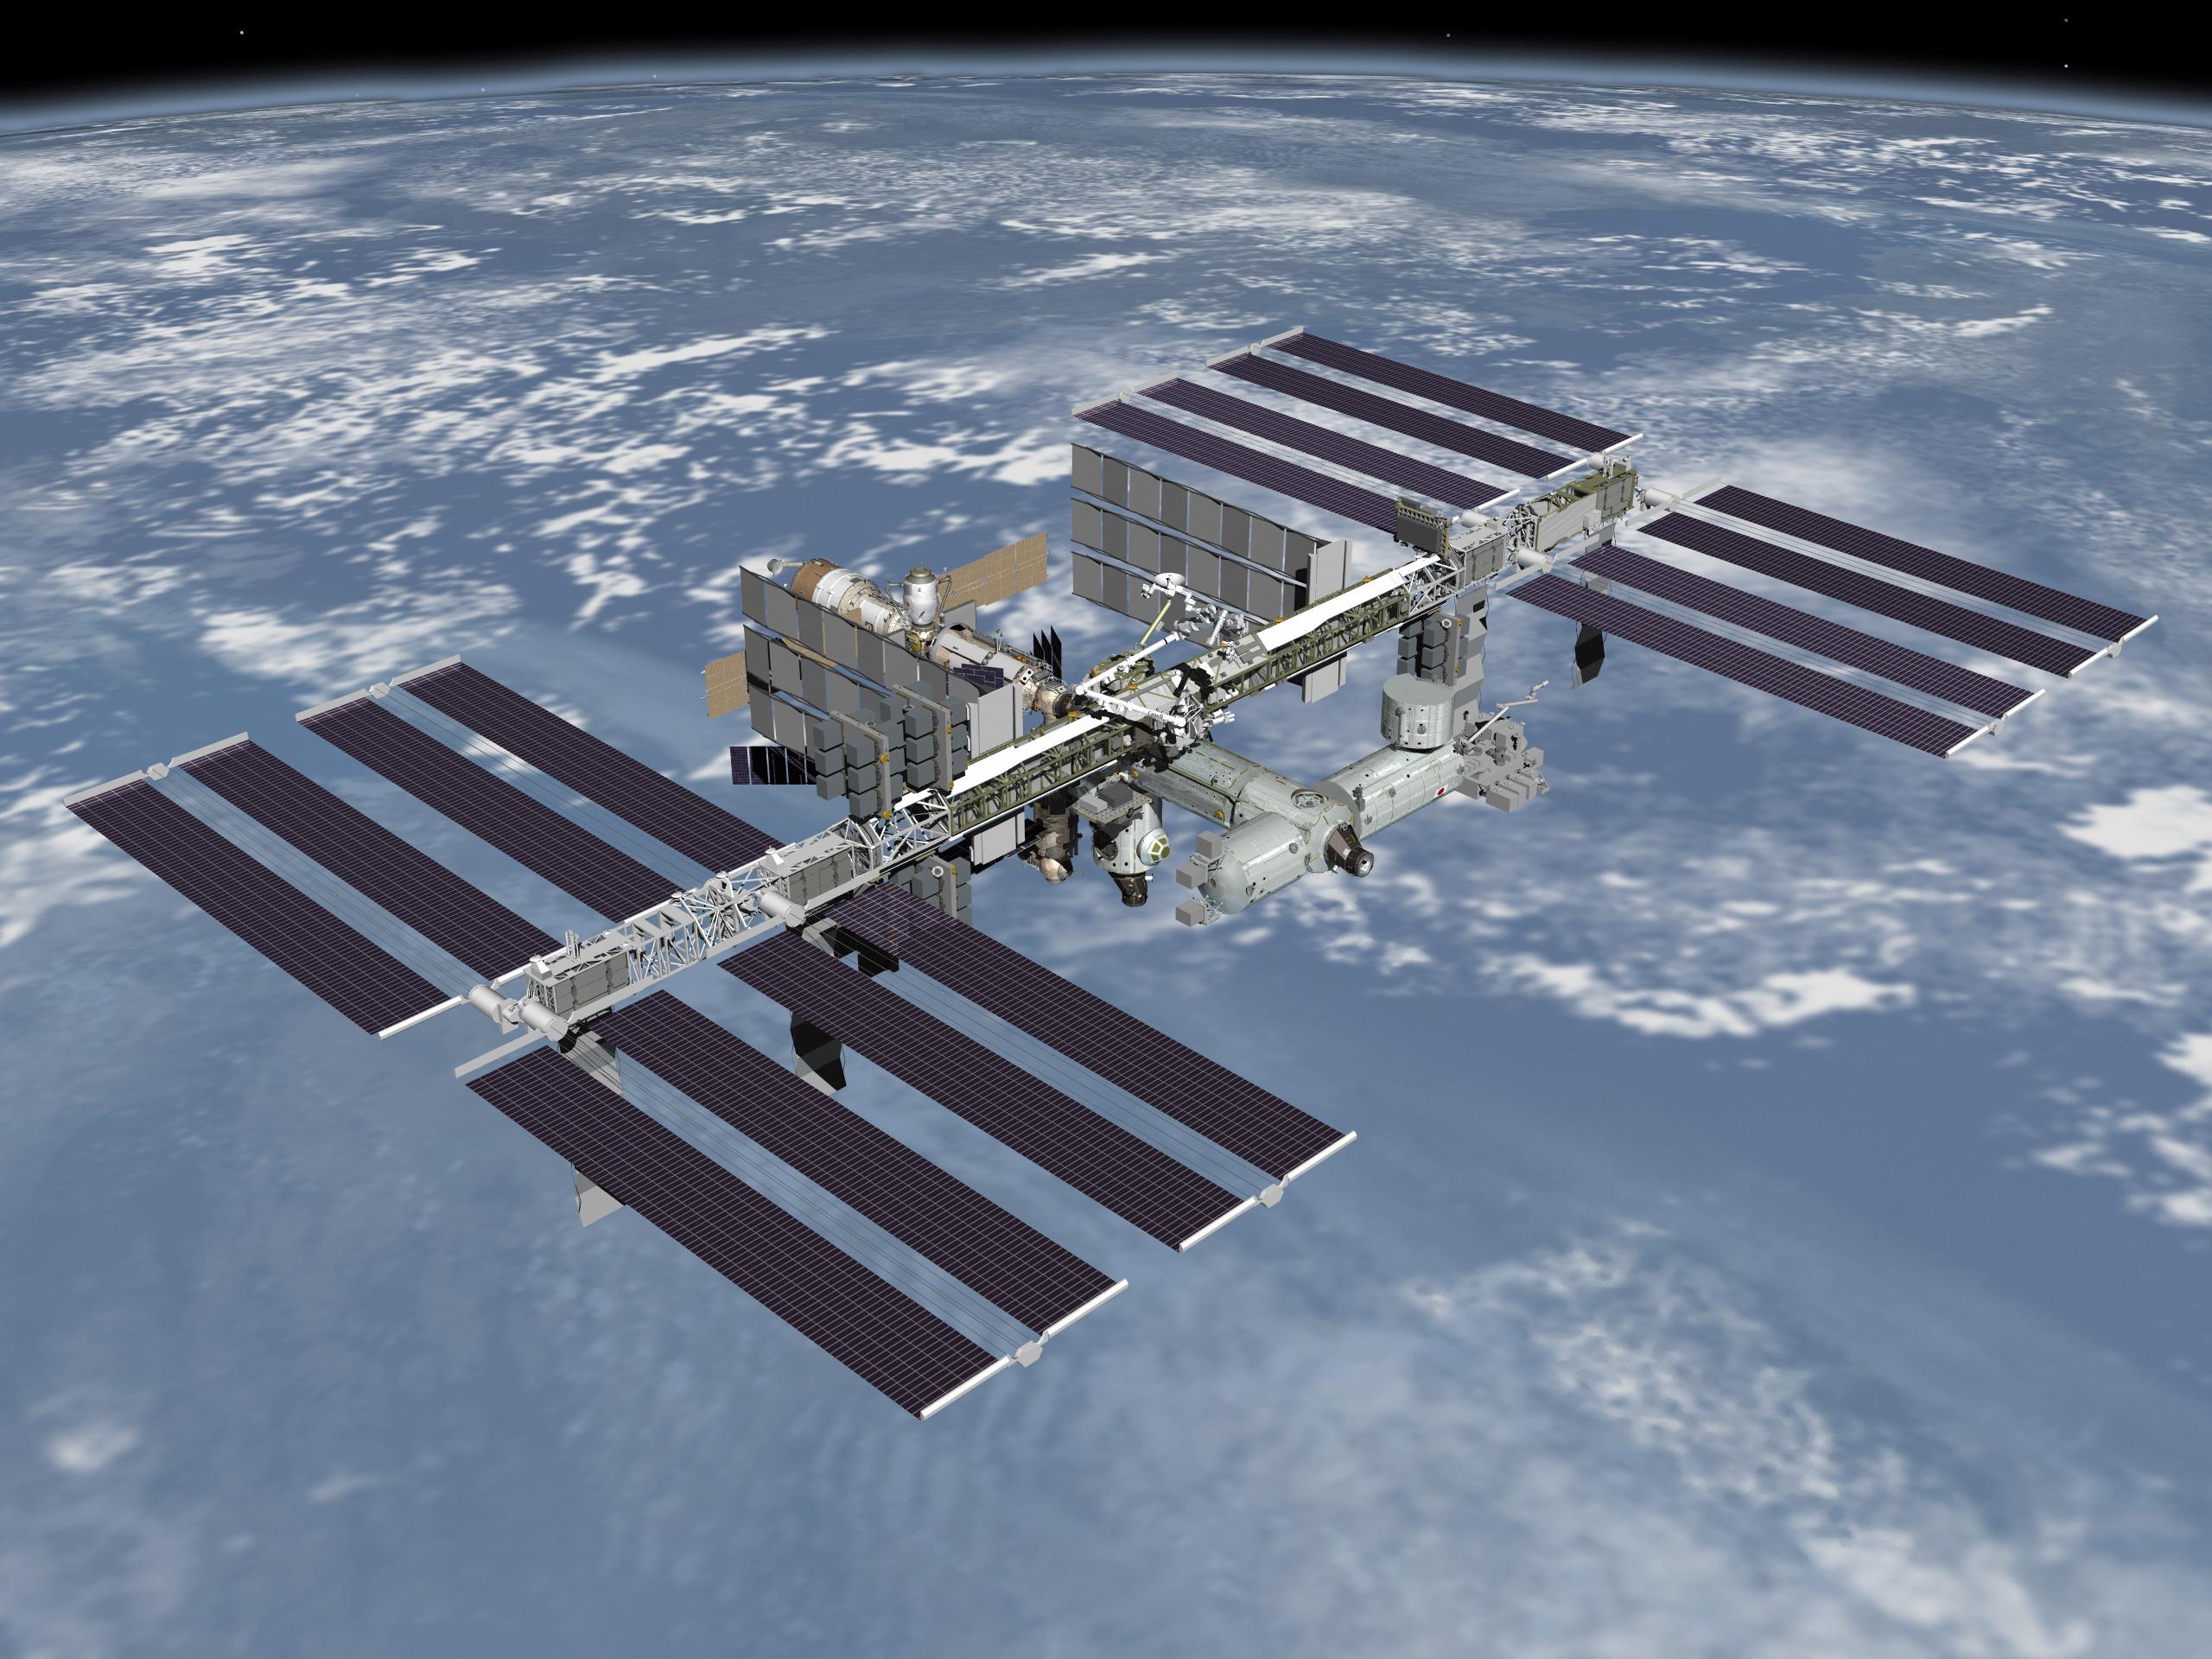 https://i2.wp.com/mediad.publicbroadcasting.net/p/wsdl/files/201410/internaitional_space_station,_nasa,gov_0.jpg